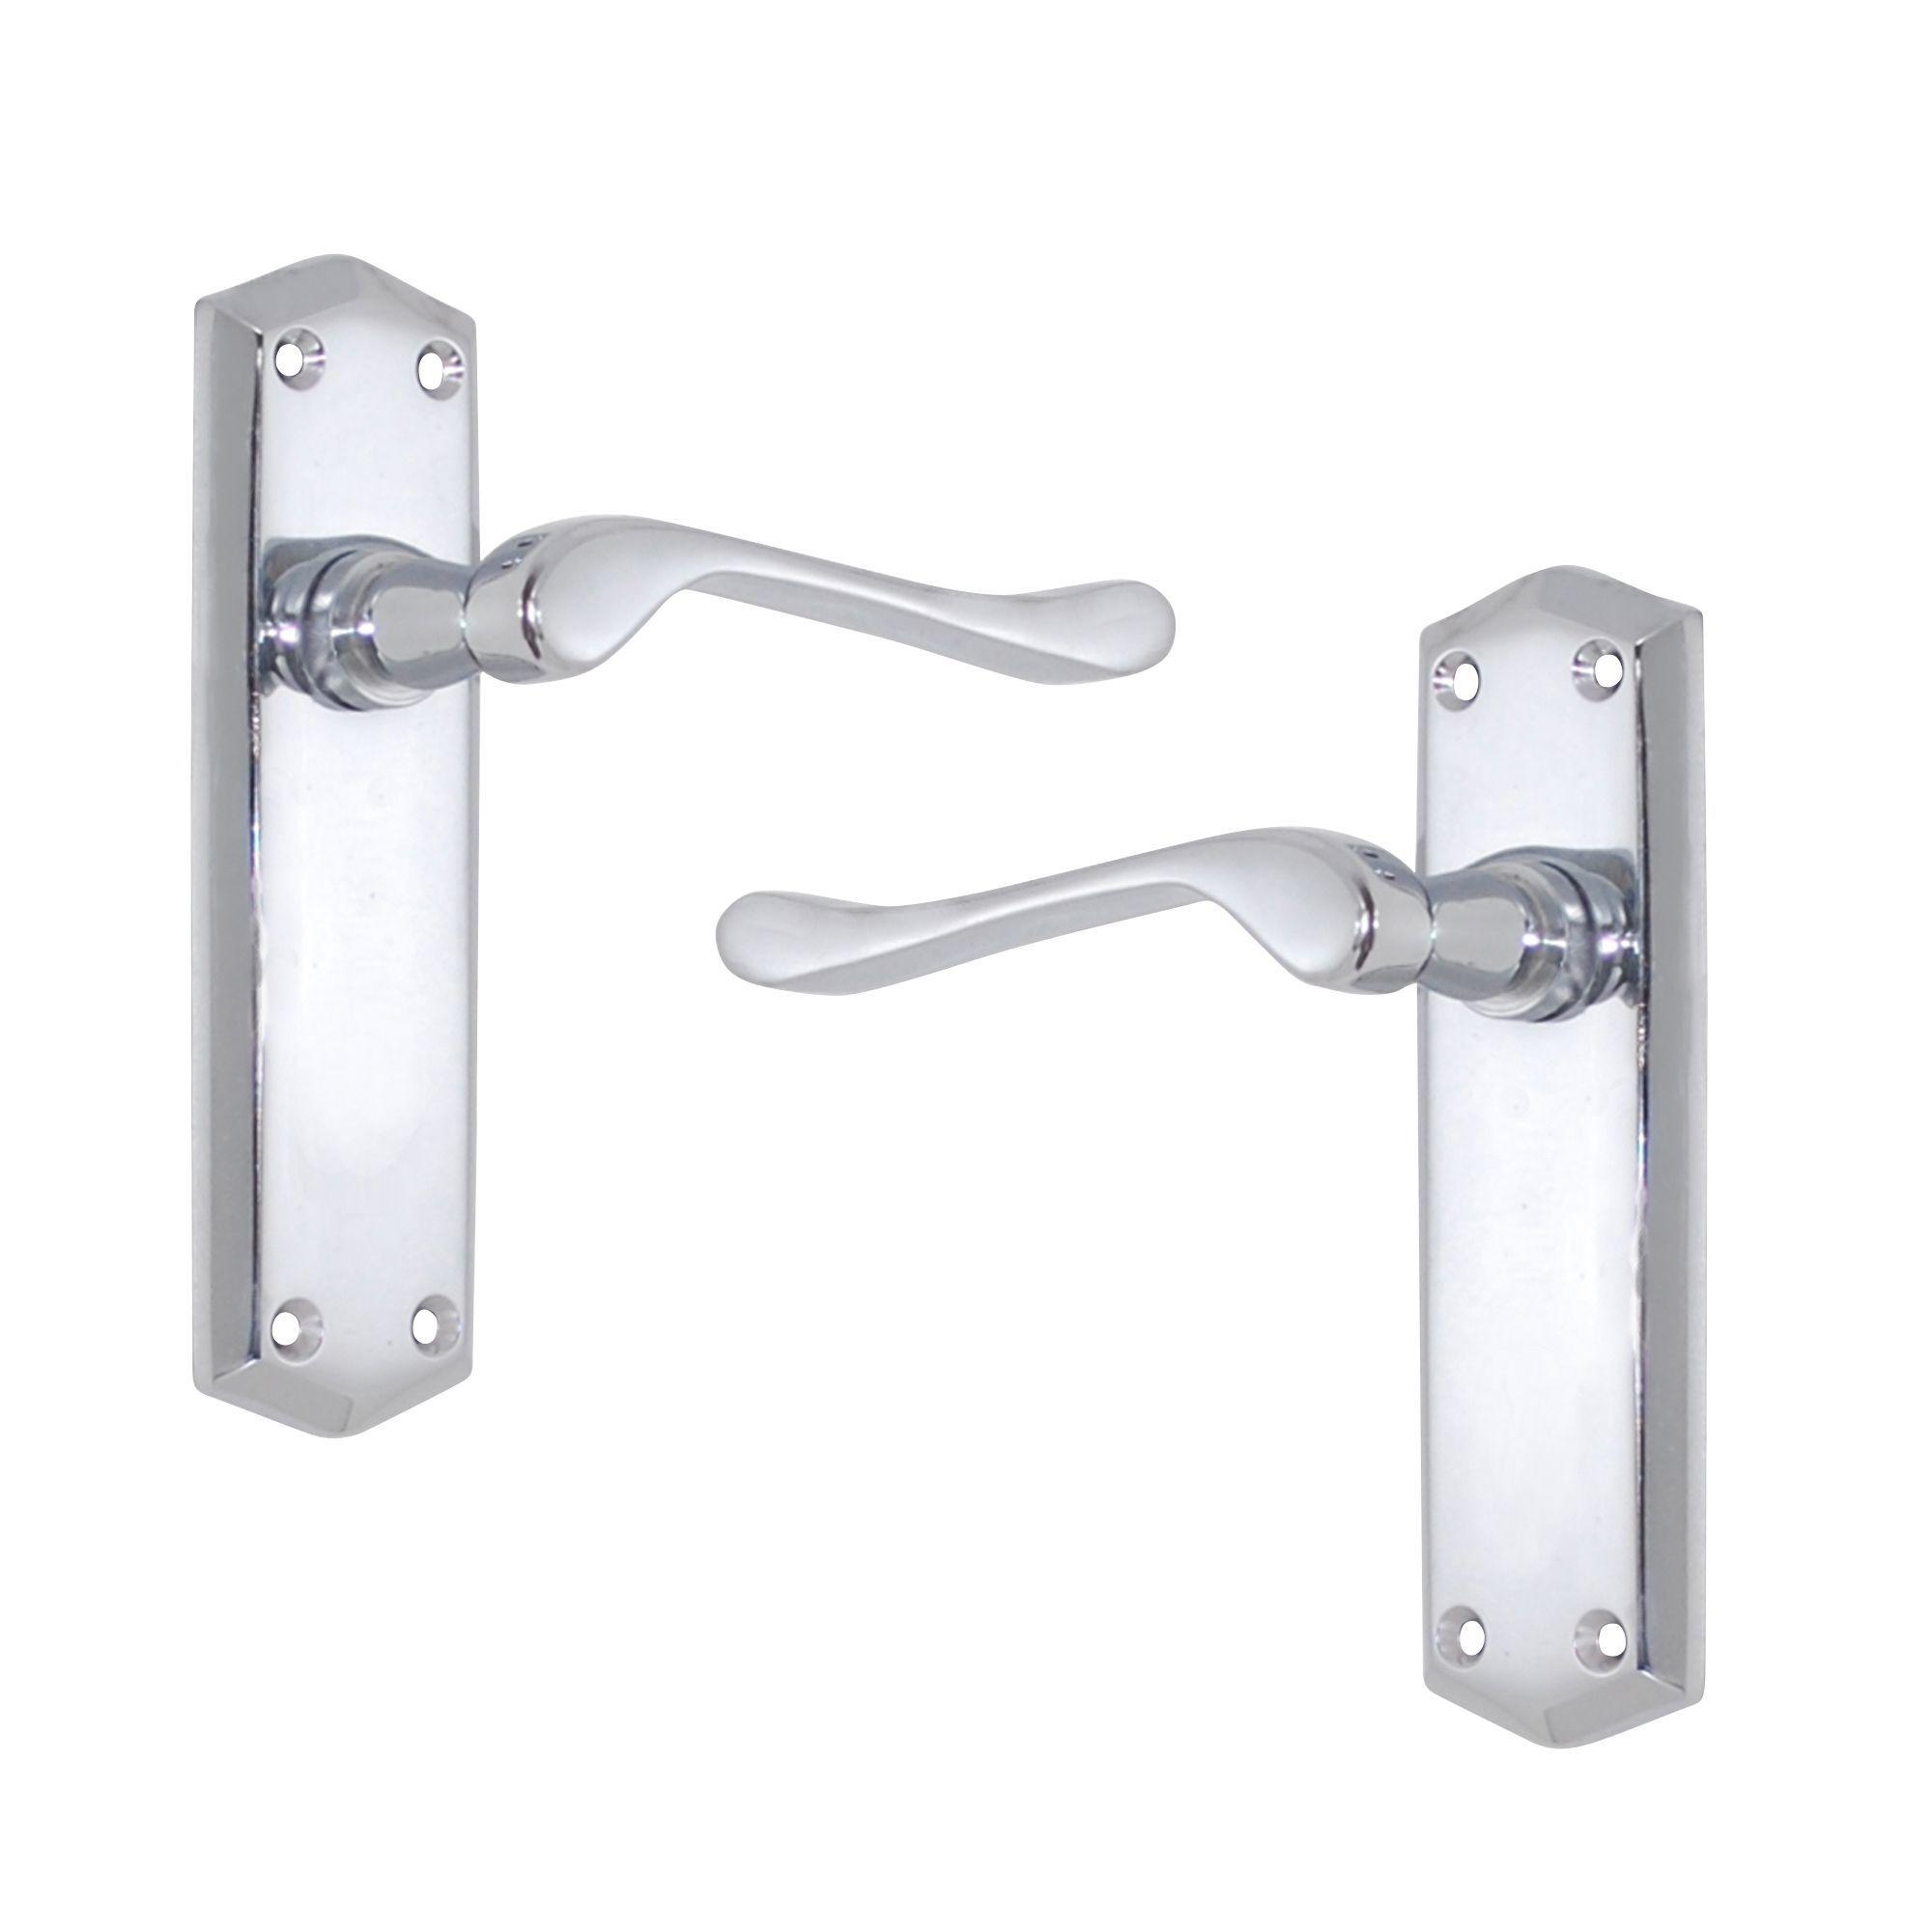 Polished Chrome Effect Internal Scroll Latch Door Handle, 1 Set